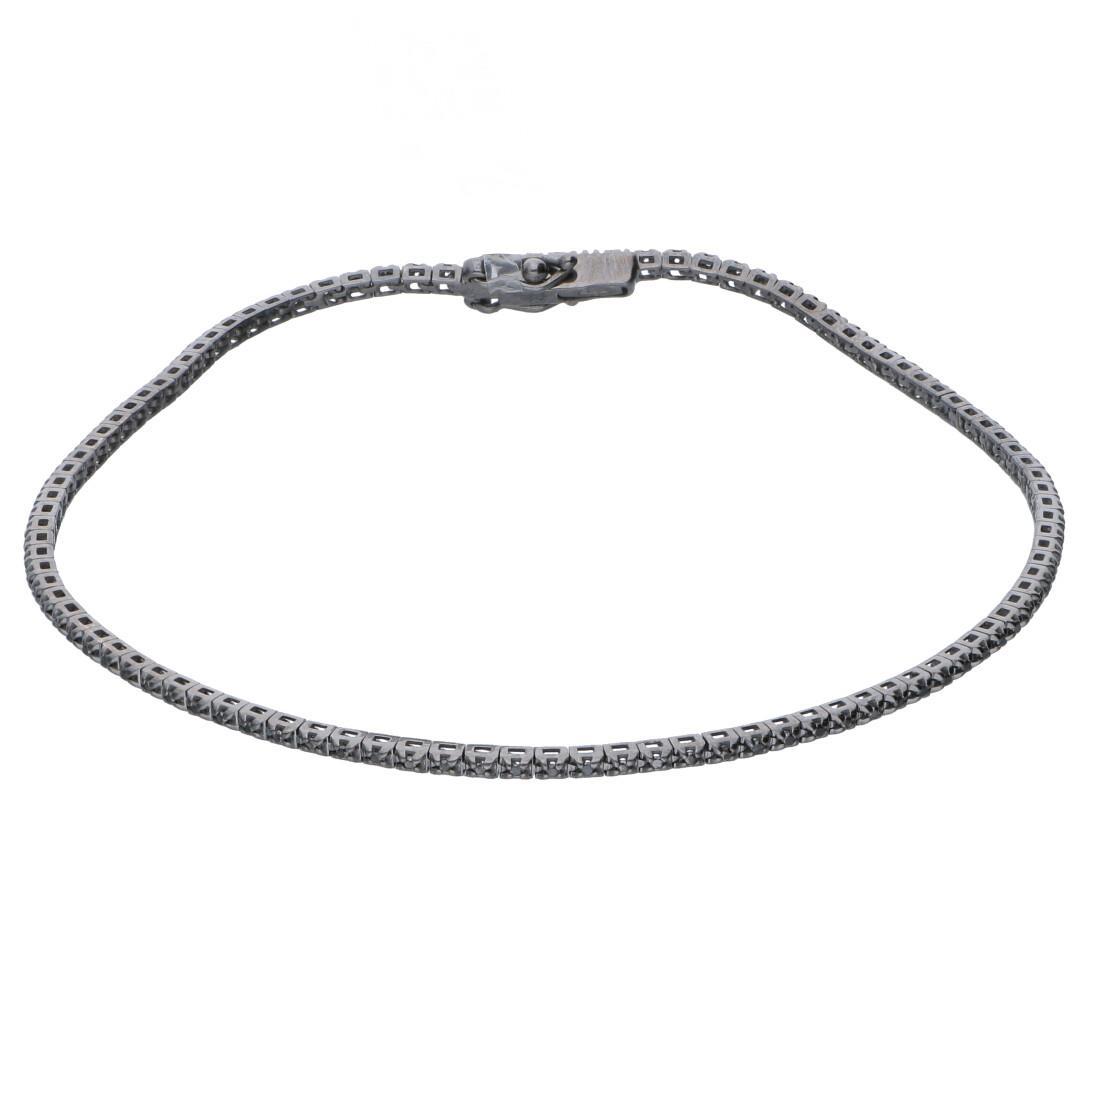 Bracciale tennis con diamanti neri - ALFIERI & ST. JOHN